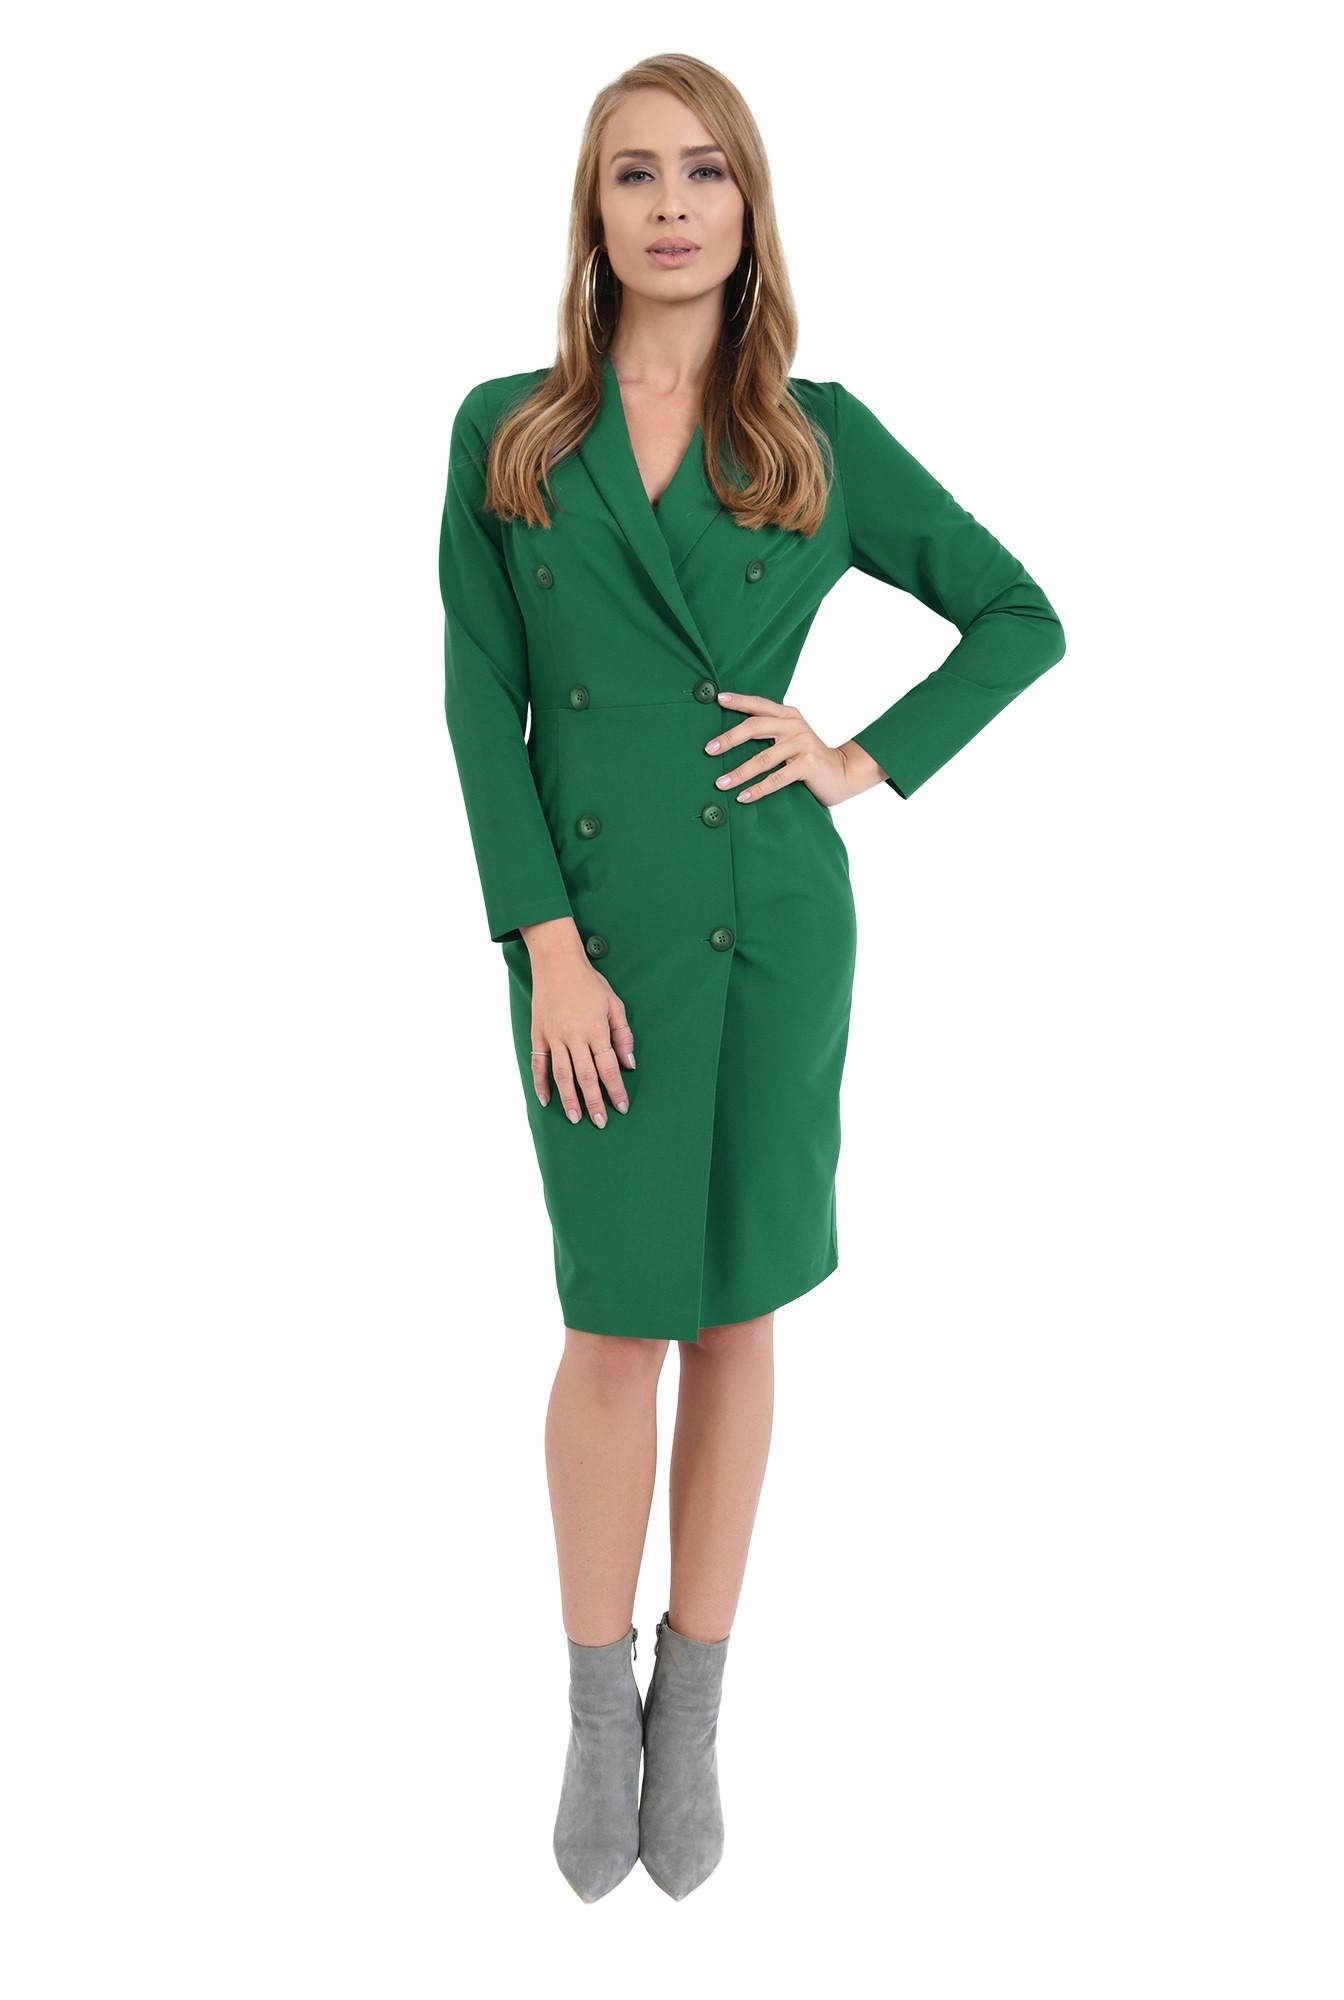 360 - rochie midi, verde, tip sacou